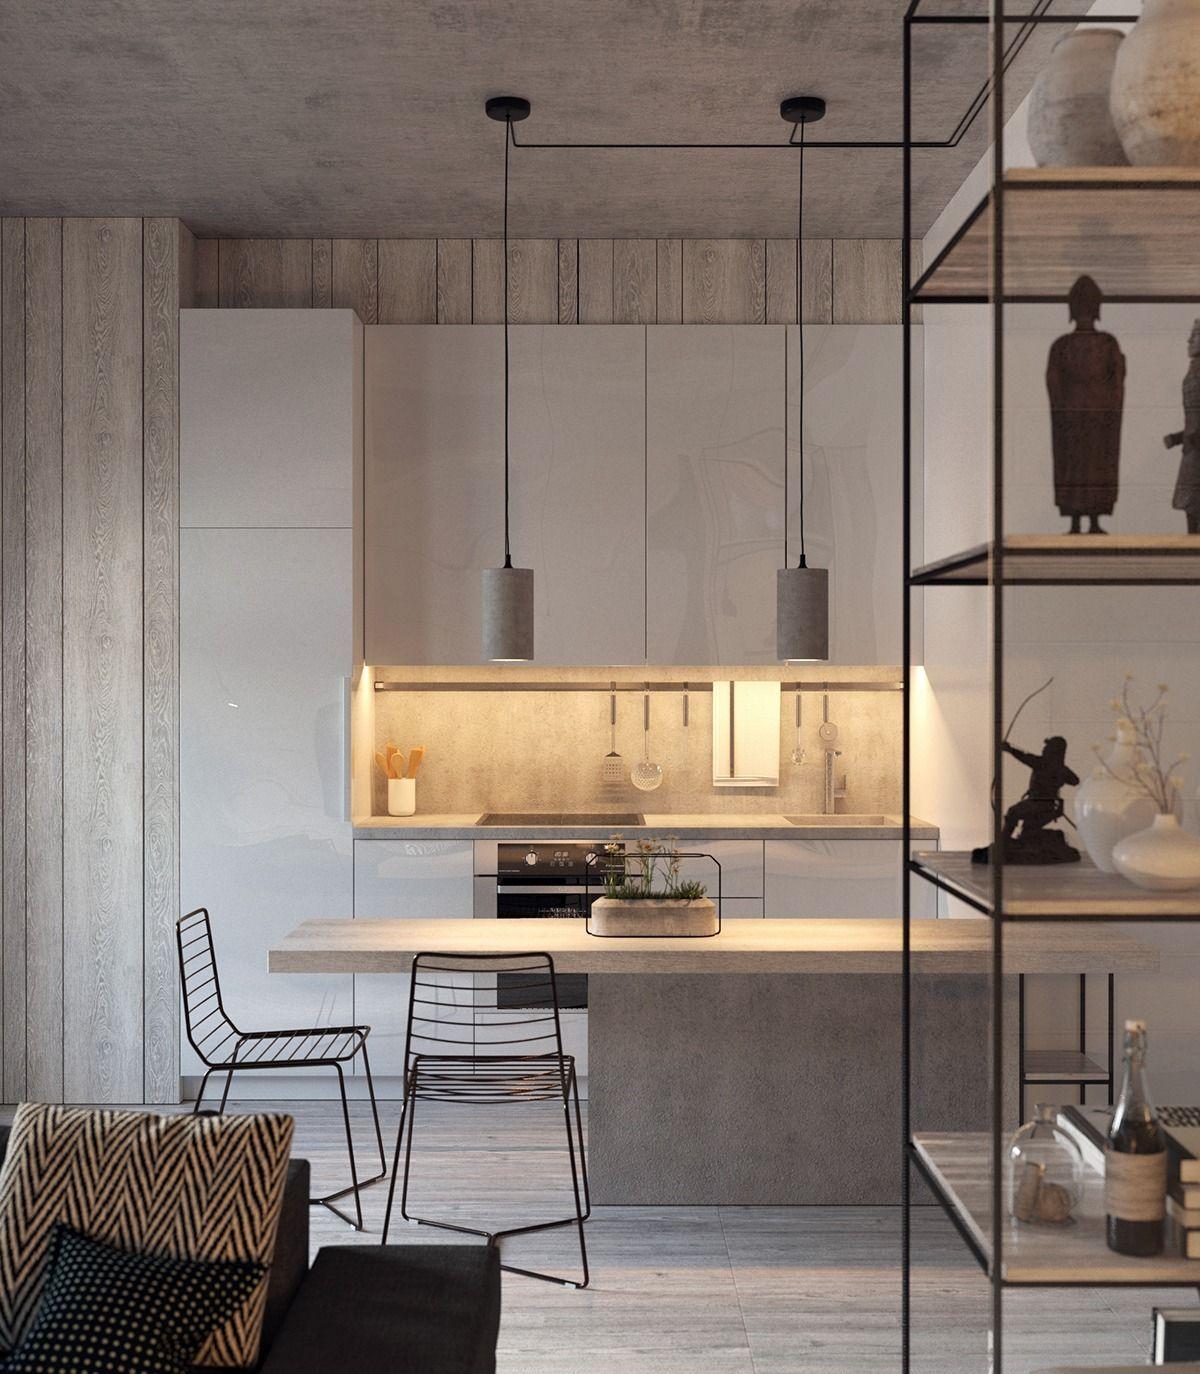 Small Home Designs Under 50 Square Meters Small Modern Kitchens Contemporary Kitchen Modern Kitchen Design